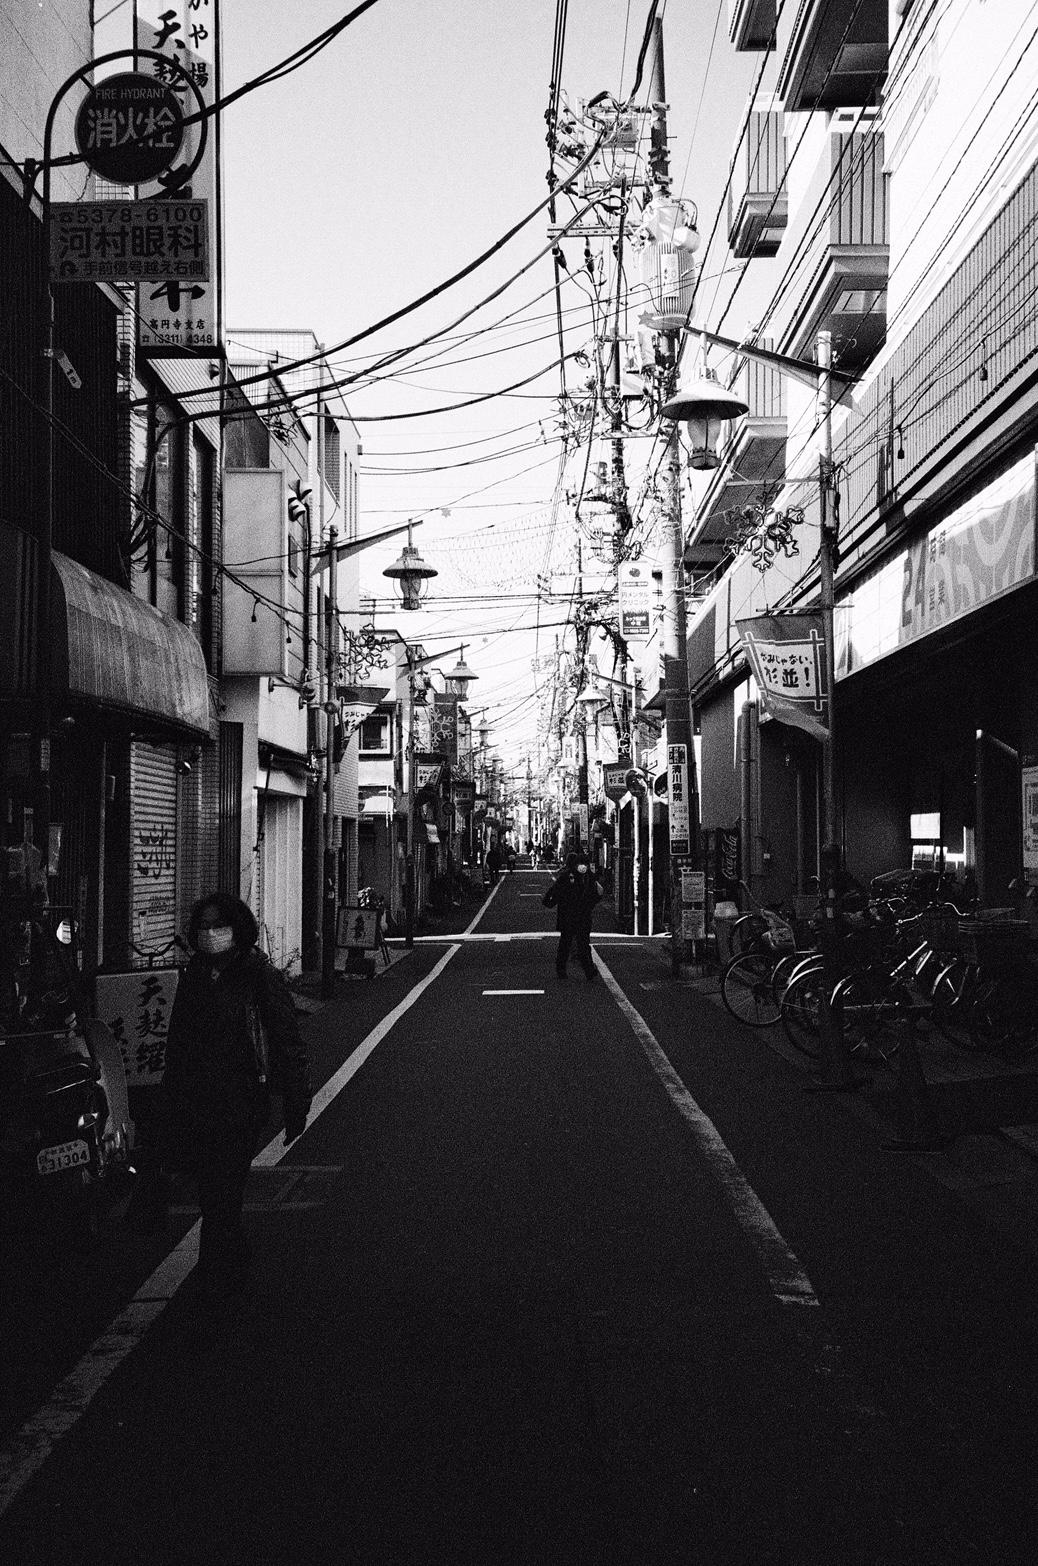 Tokyo, Japan in 35mm black & white film. Ryan Adams Prisoner Tour December 2016.